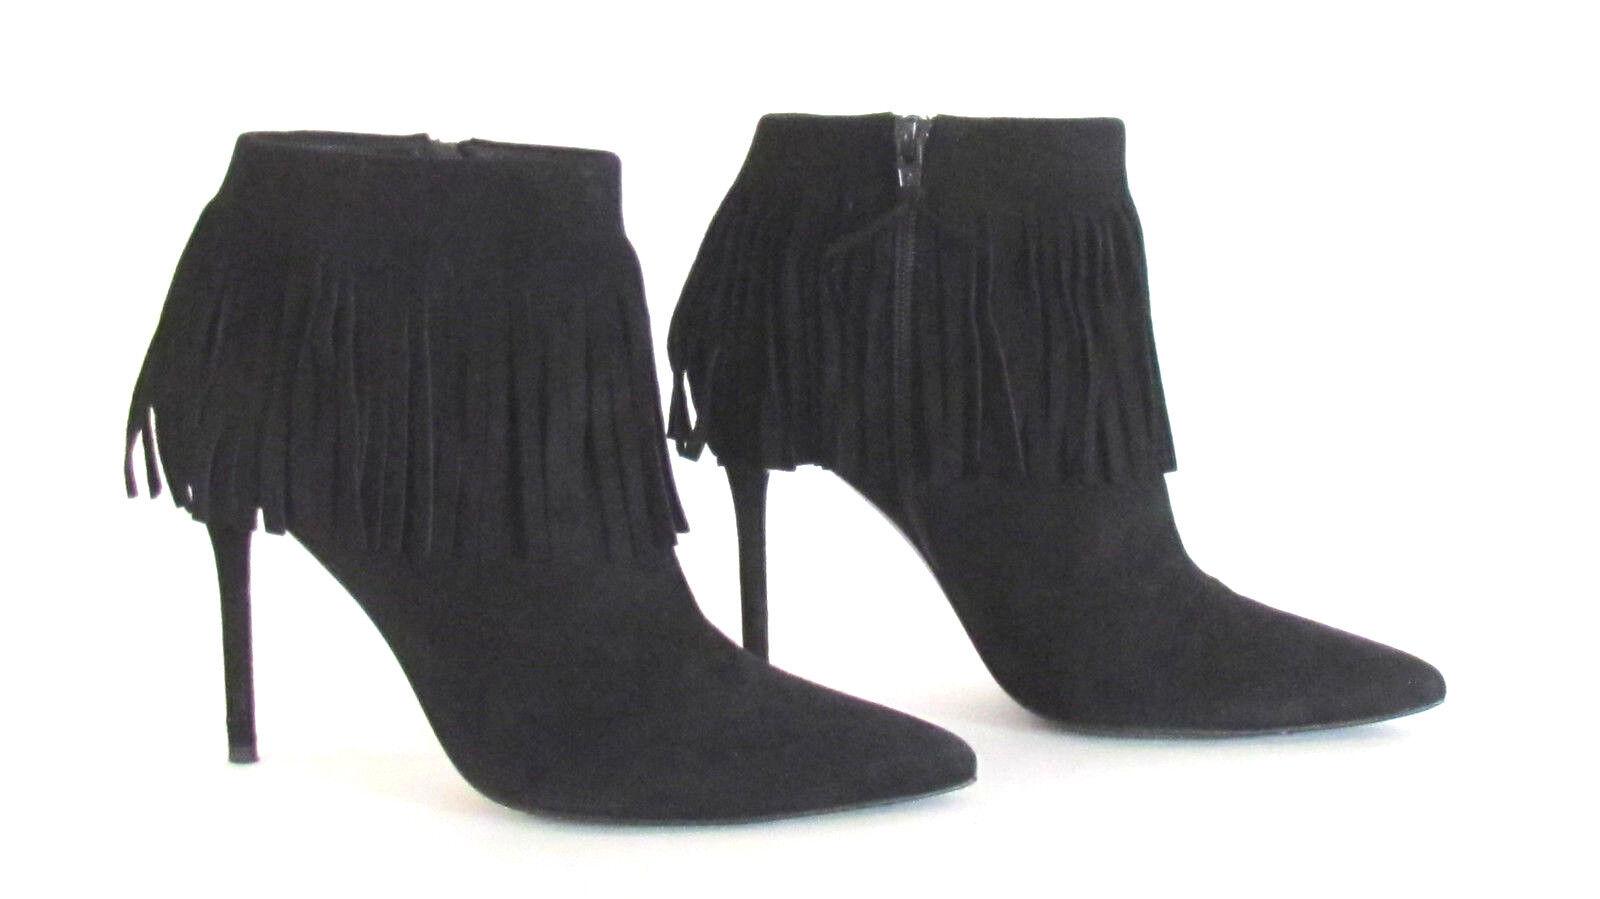 Stuart Weitzman Women's Fringe Black Suede Pointy Toe High Heel Ankle Boots  9.M